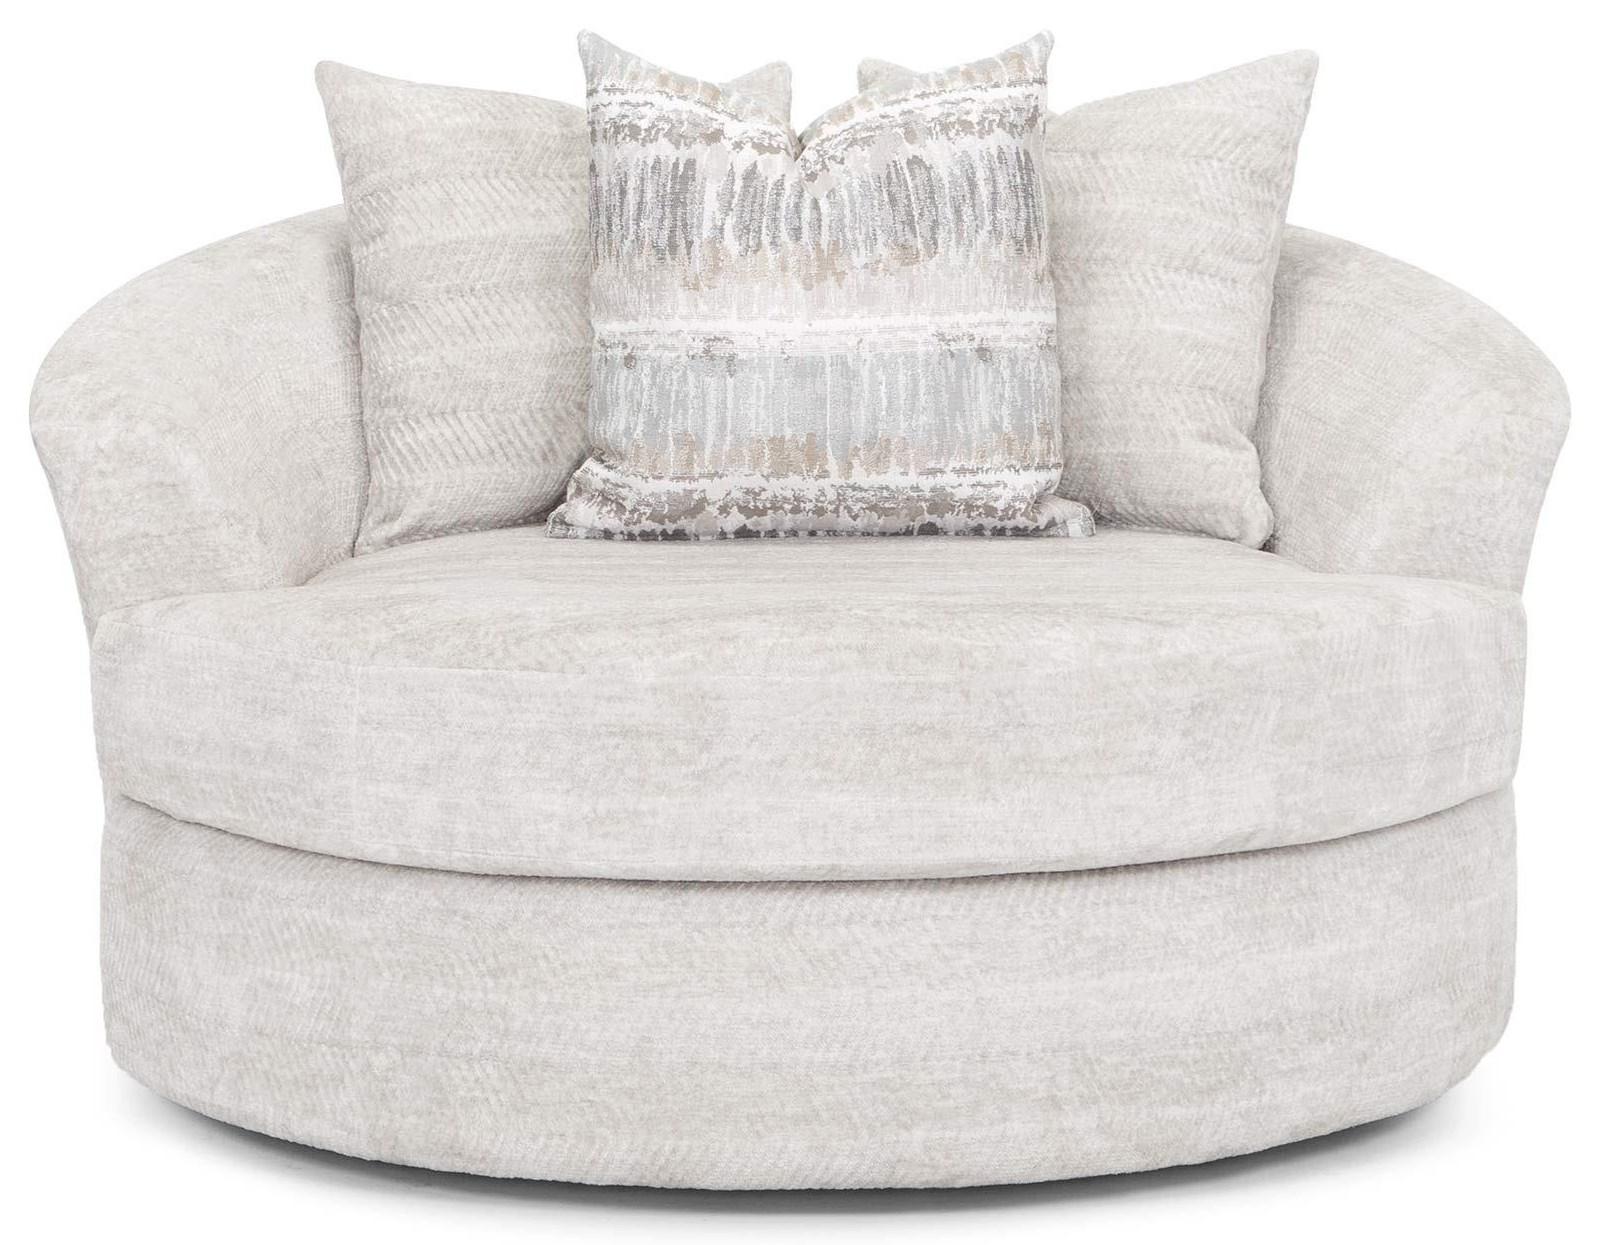 945 Nash Swivel Chair by Franklin at Furniture Fair - North Carolina